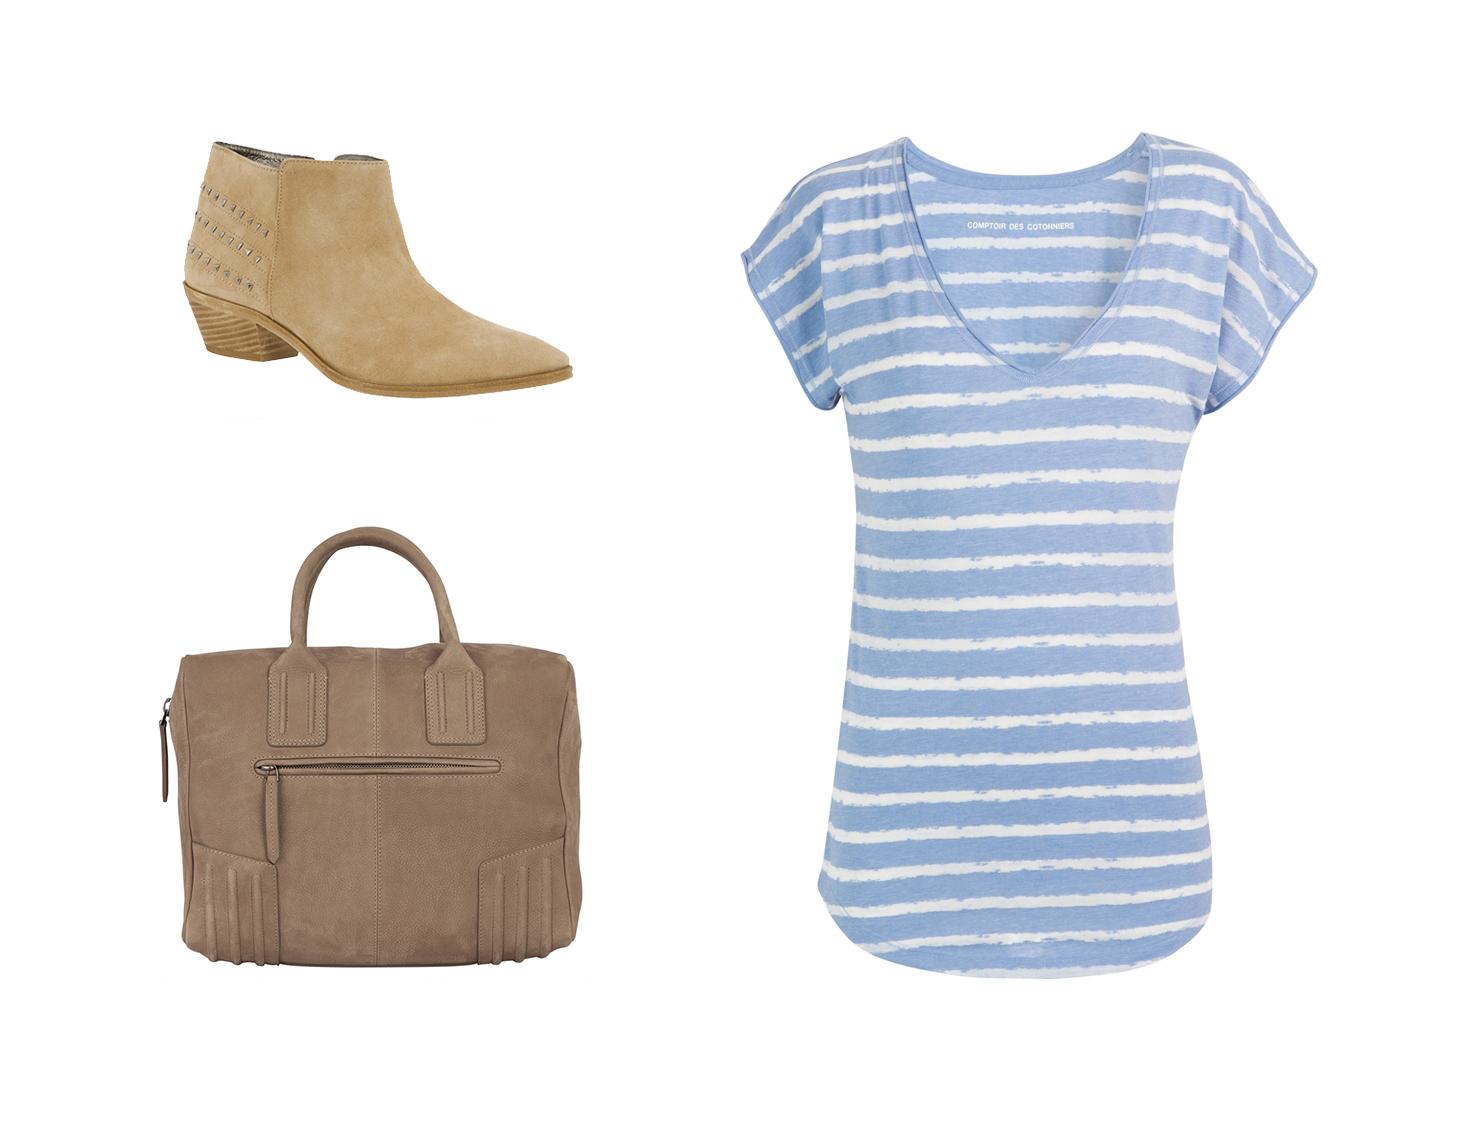 trendy_taste-look-outfit-blog-blogger-fashion_spain-moda_españa-giveaway-sorteo-comptoir_des_cotonniers-collage-1